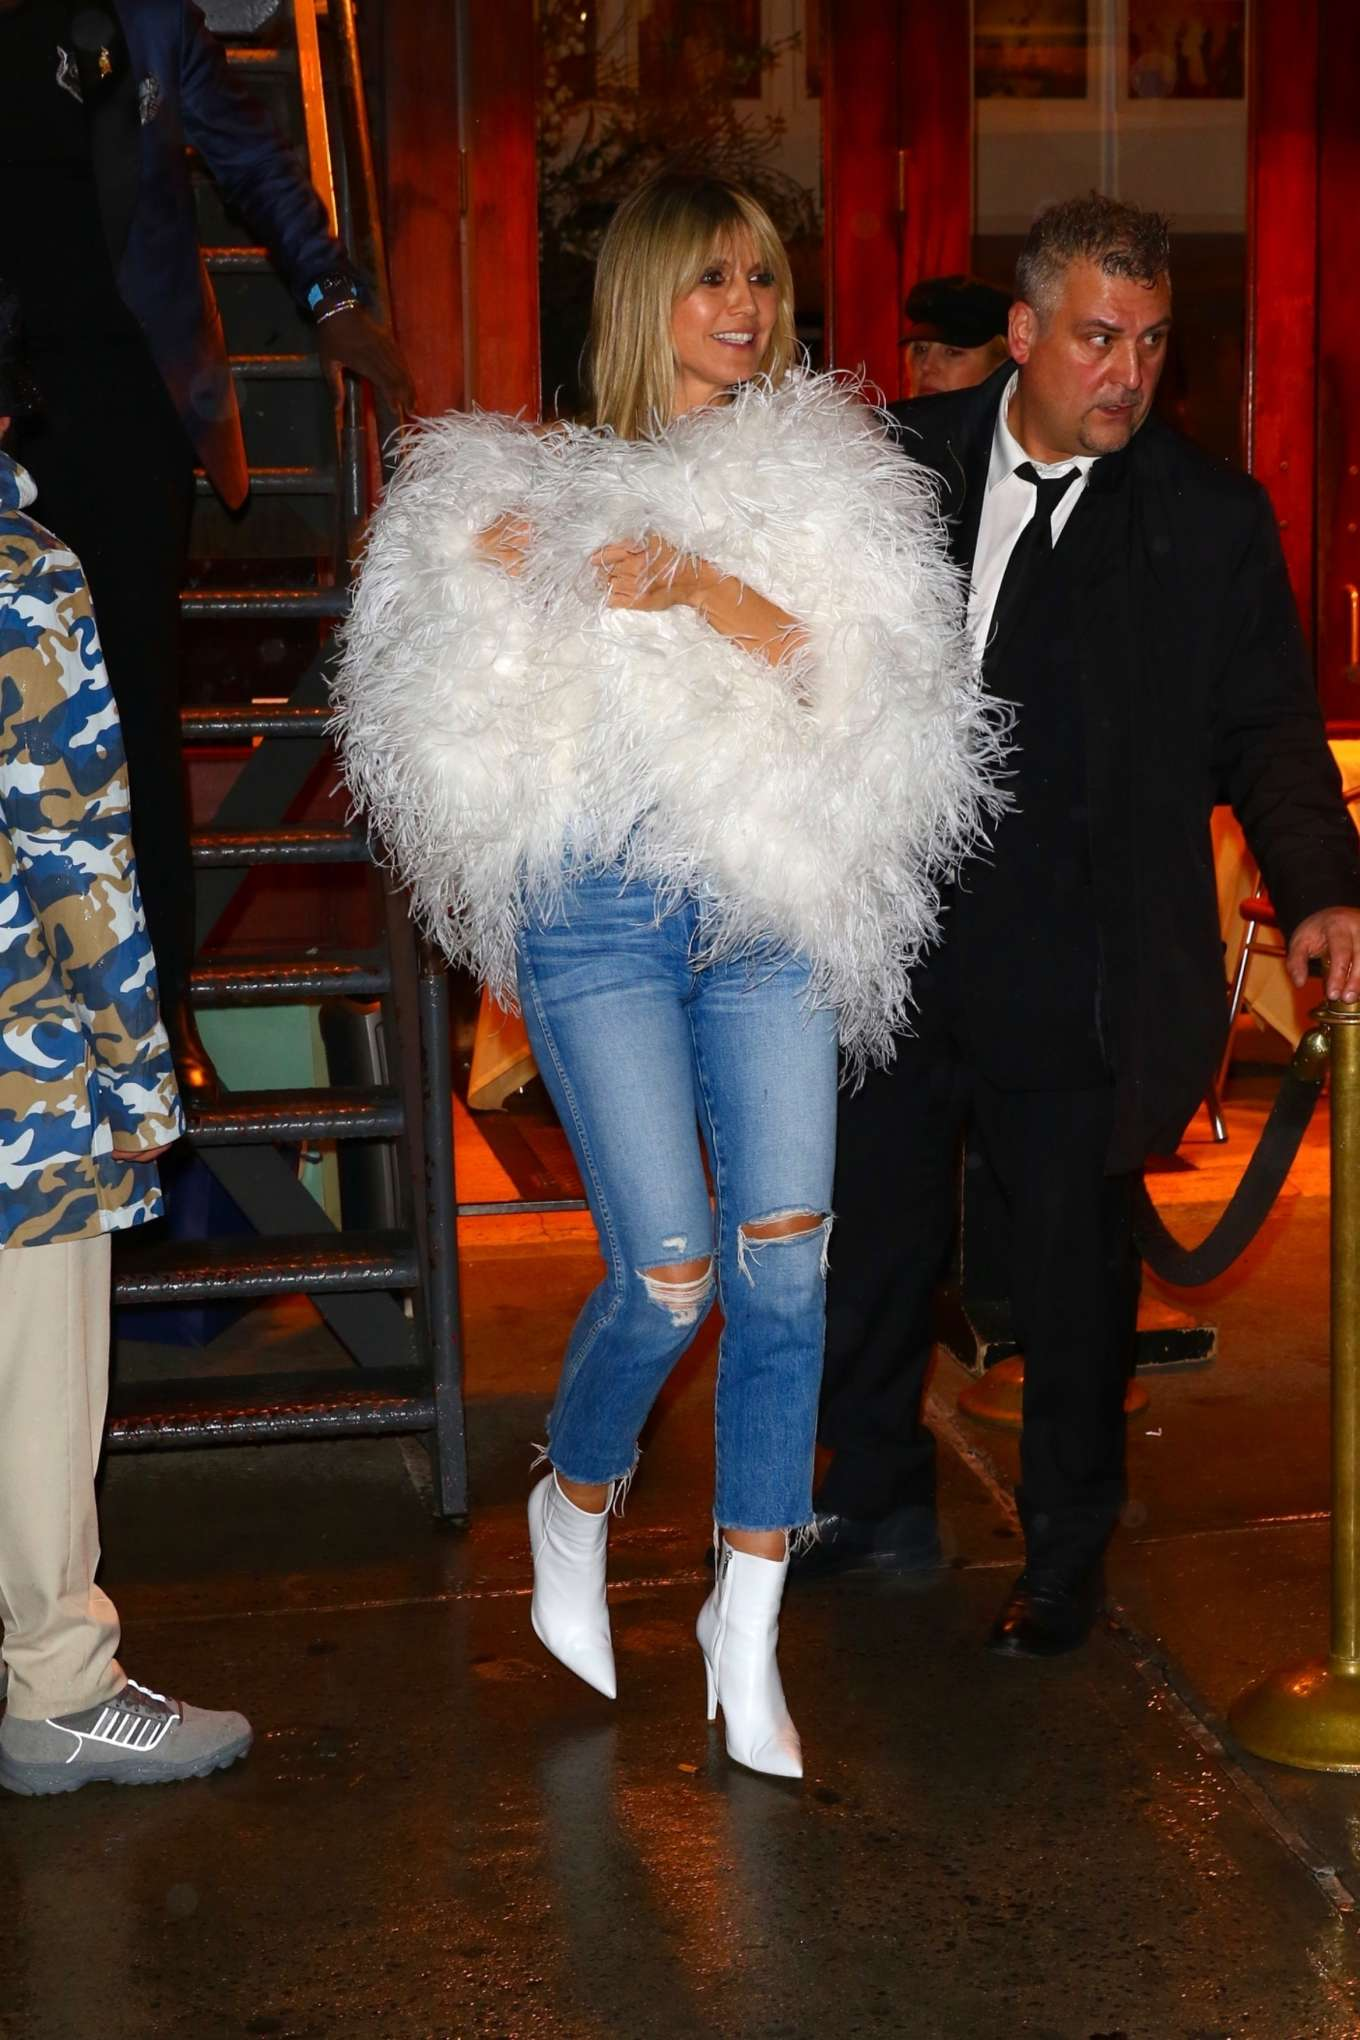 Heidi Klum 2020 : Heidi Klum – Heads to a party after the amfAR Gala in New York-07